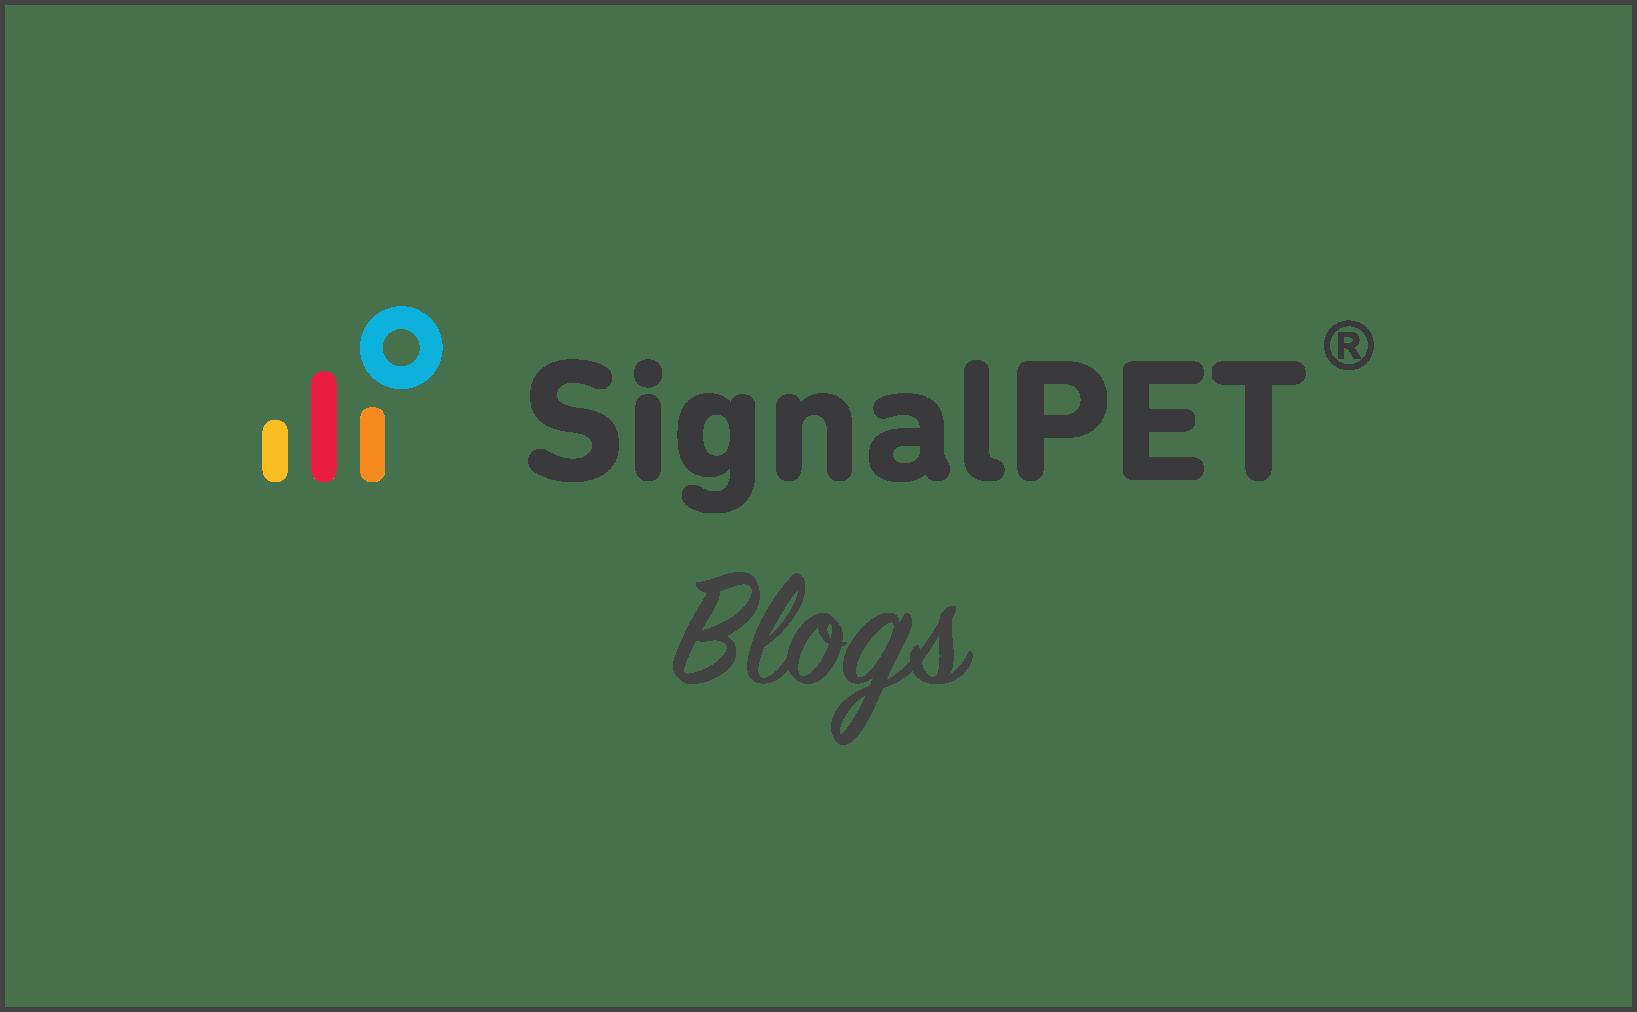 SignalPET Blog